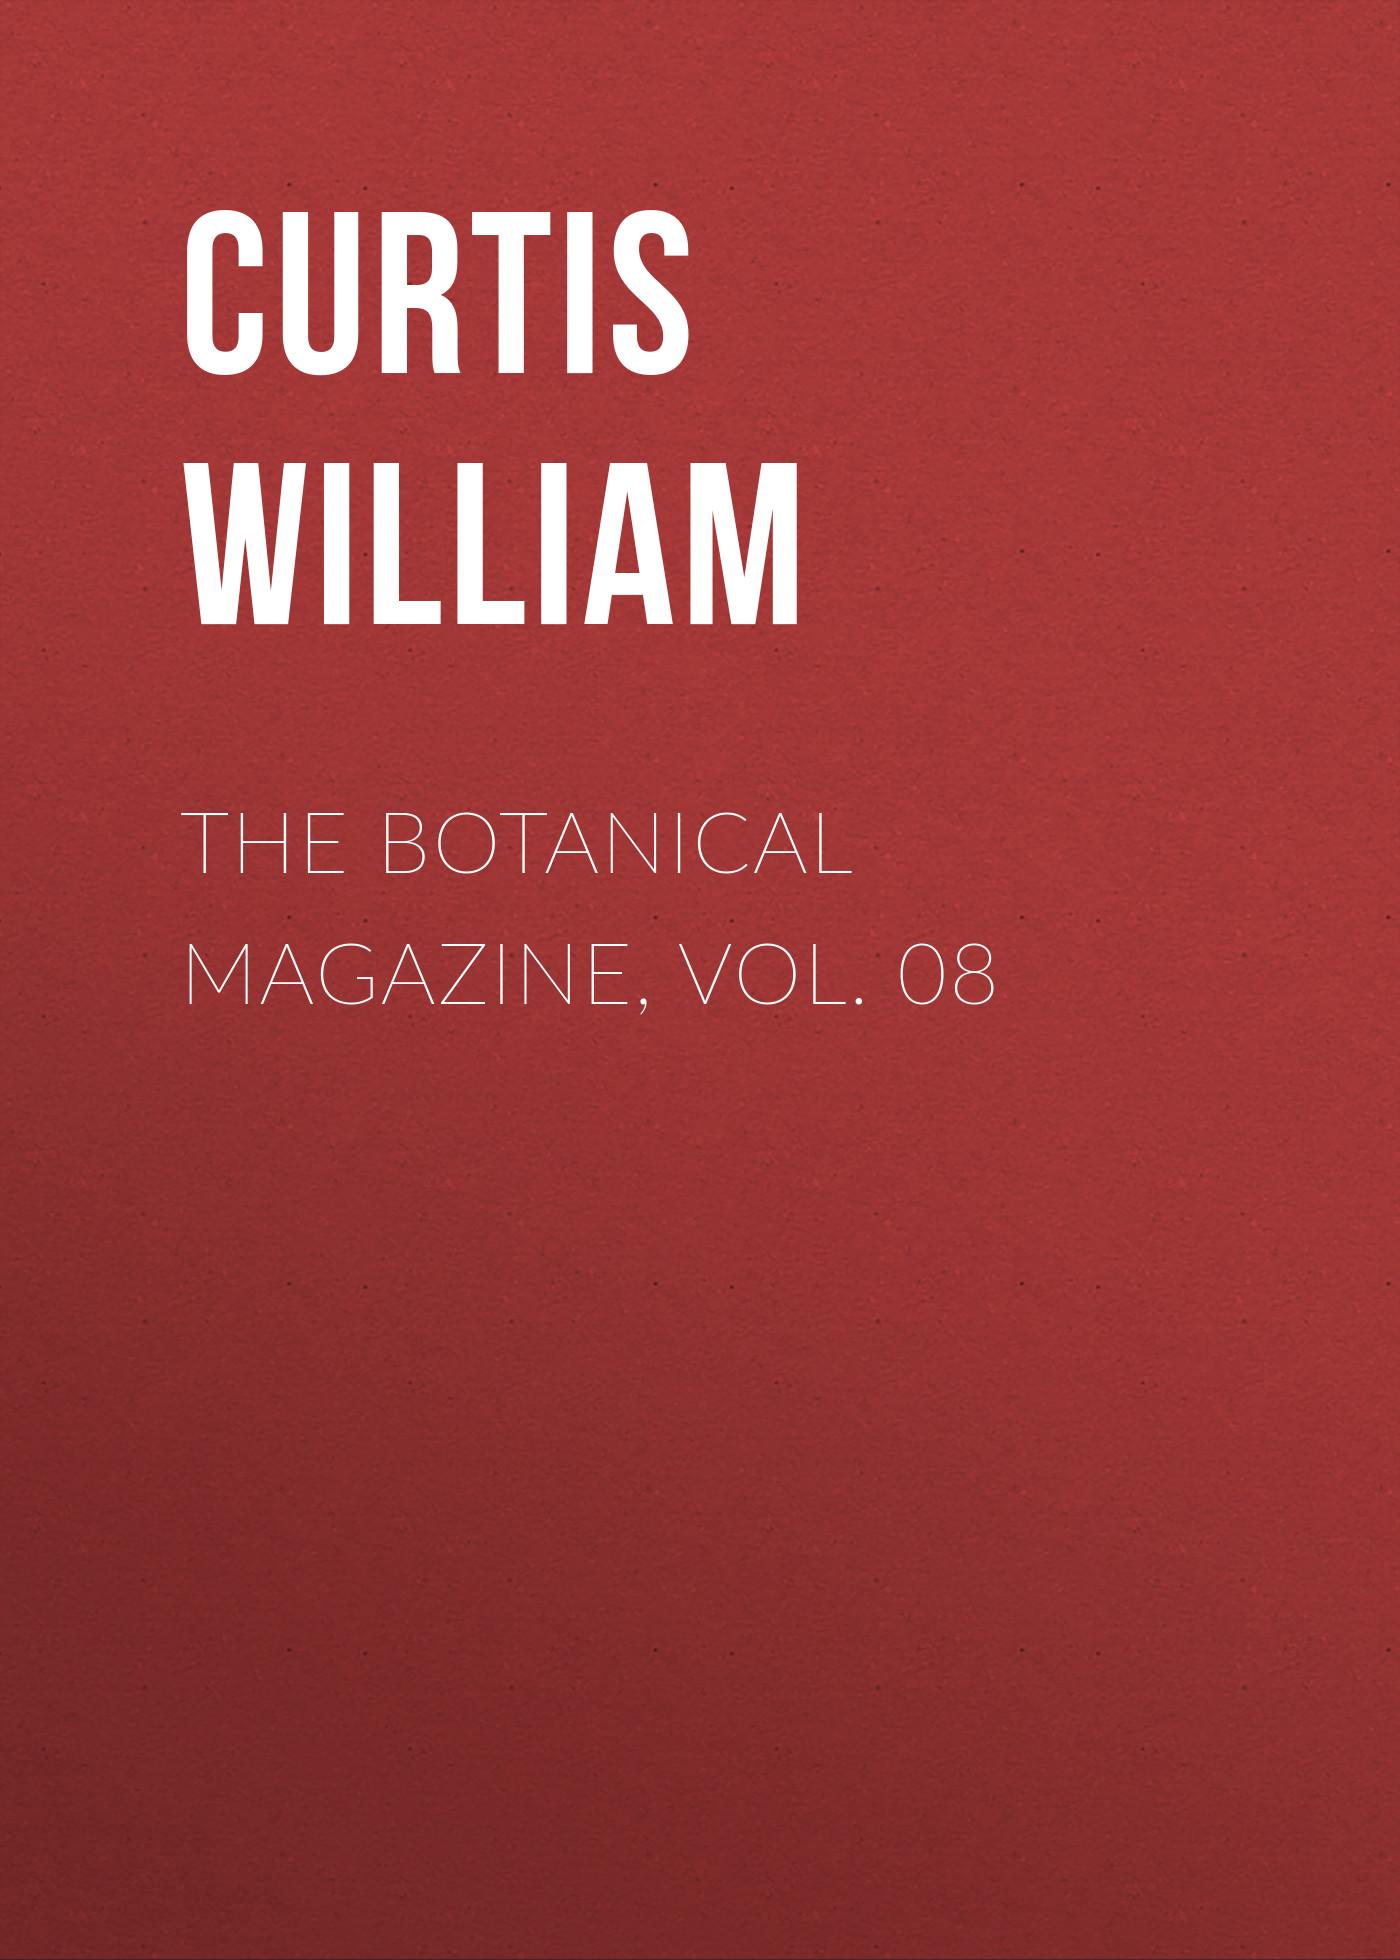 Curtis William The Botanical Magazine, Vol. 08 george curtis the last realm